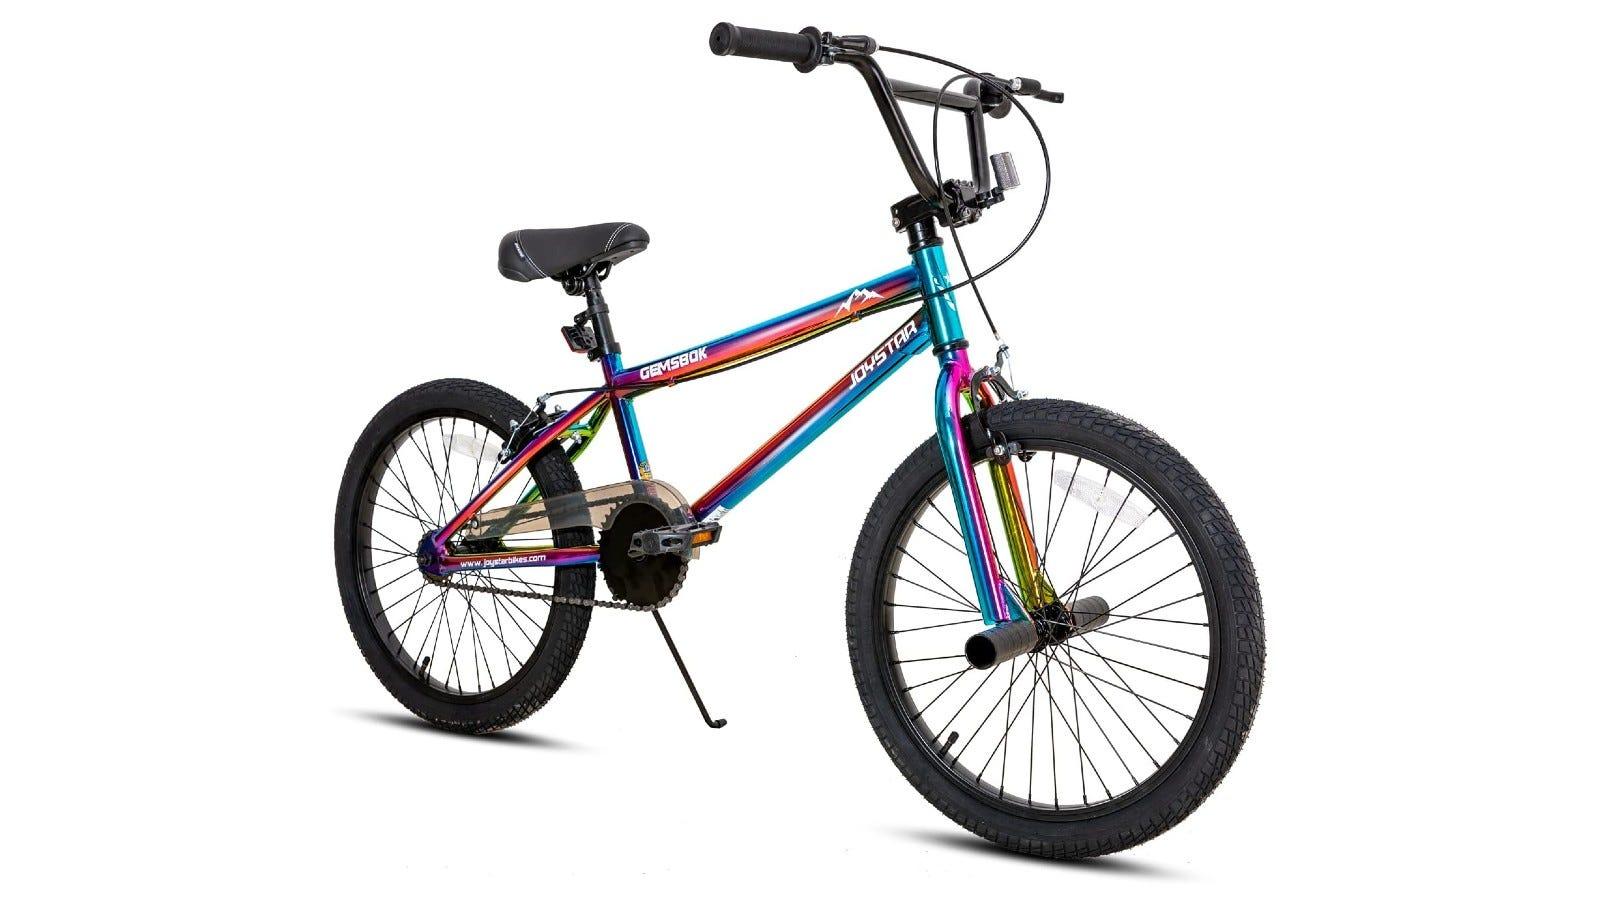 A BMX bike that features a rainbow paint job and handlebar brakes